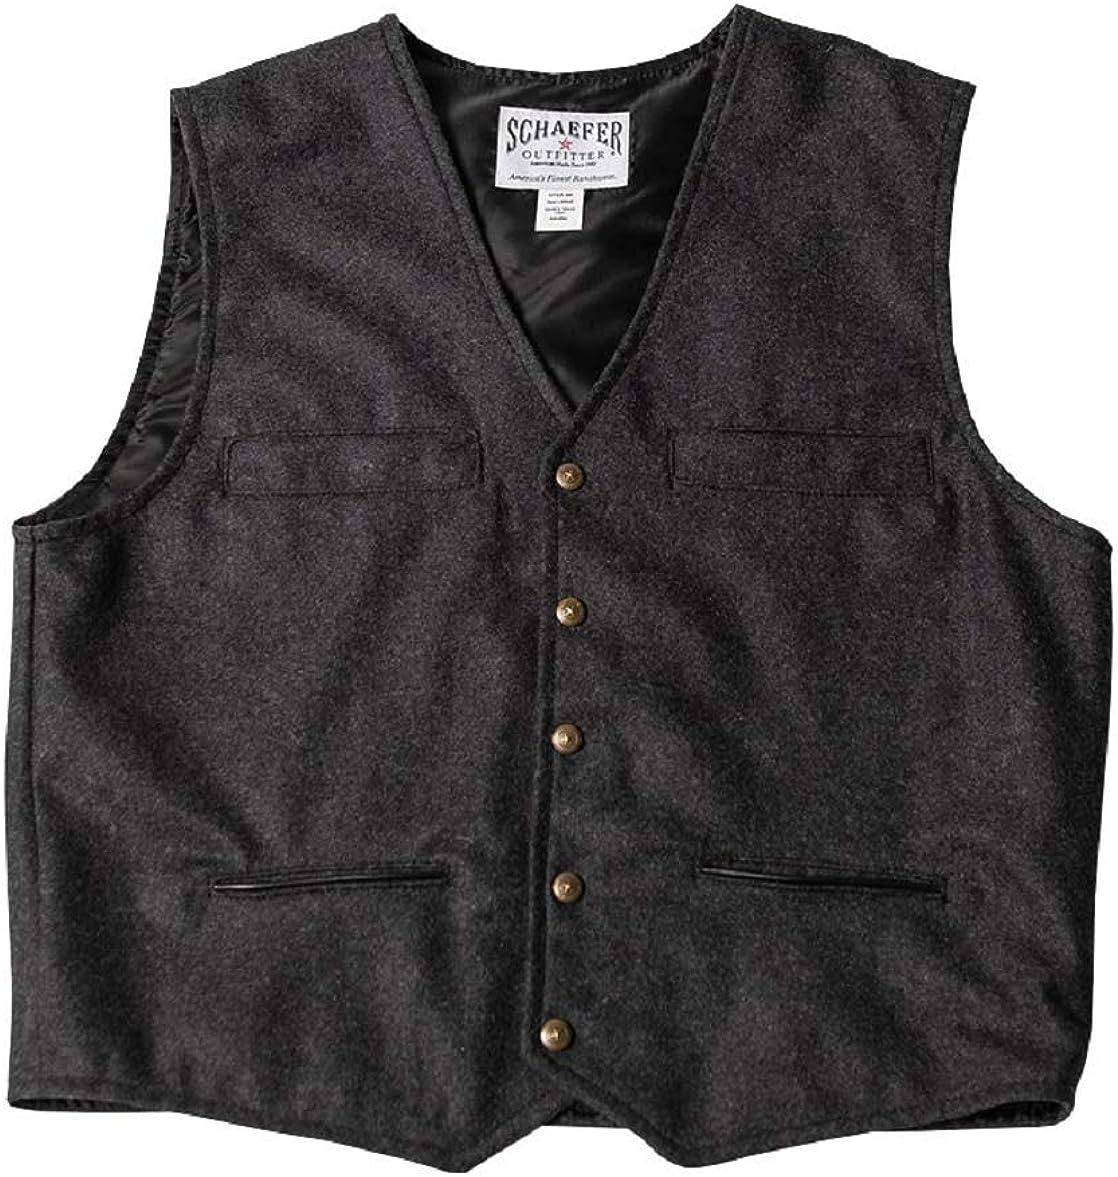 McAllin Vest